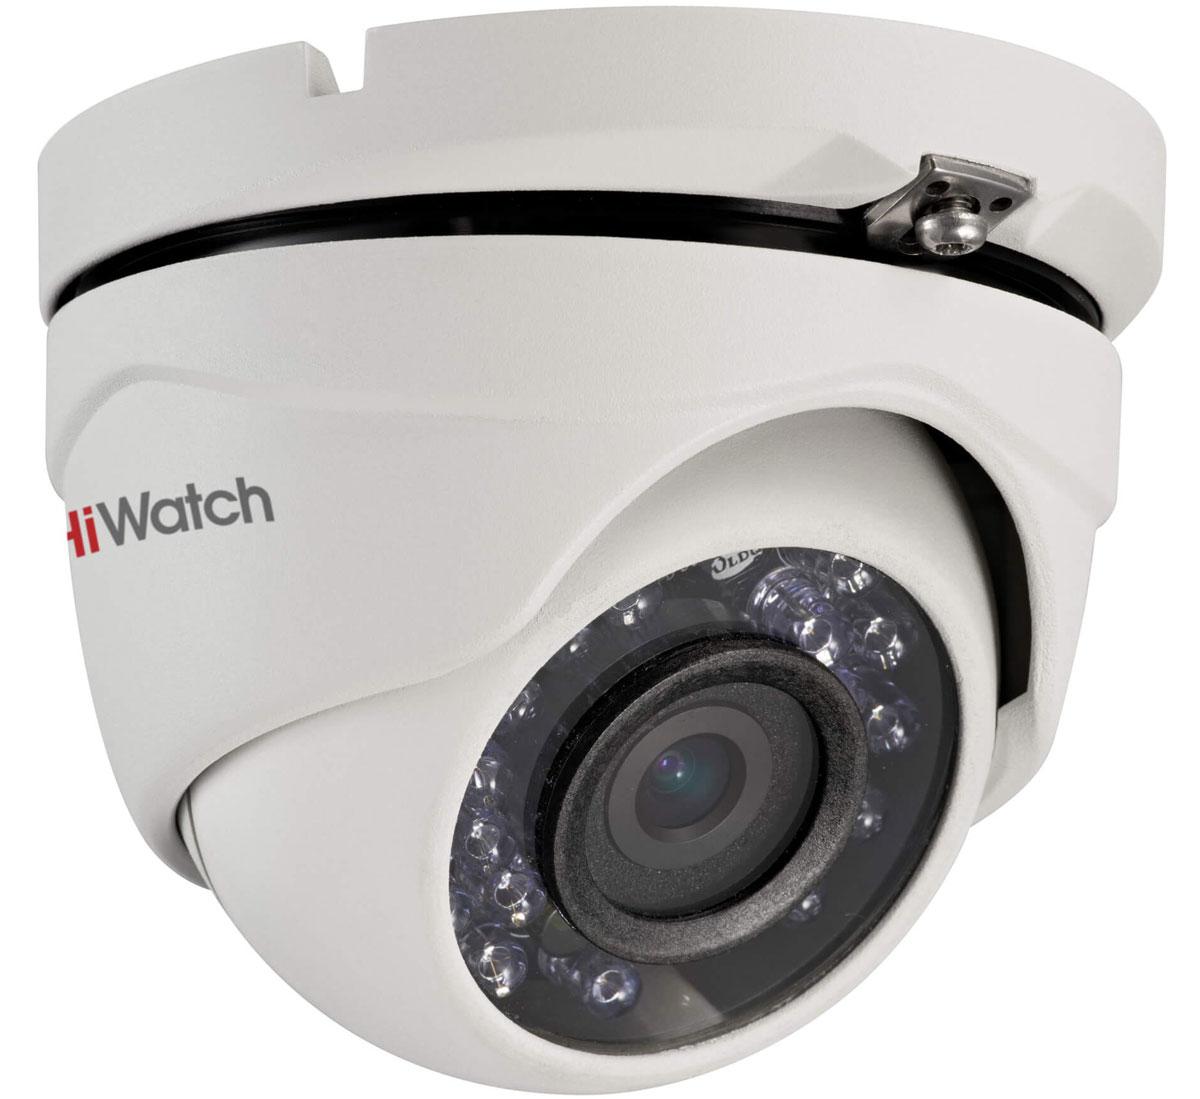 Hiwatch DS-T103 камера видеонаблюдения